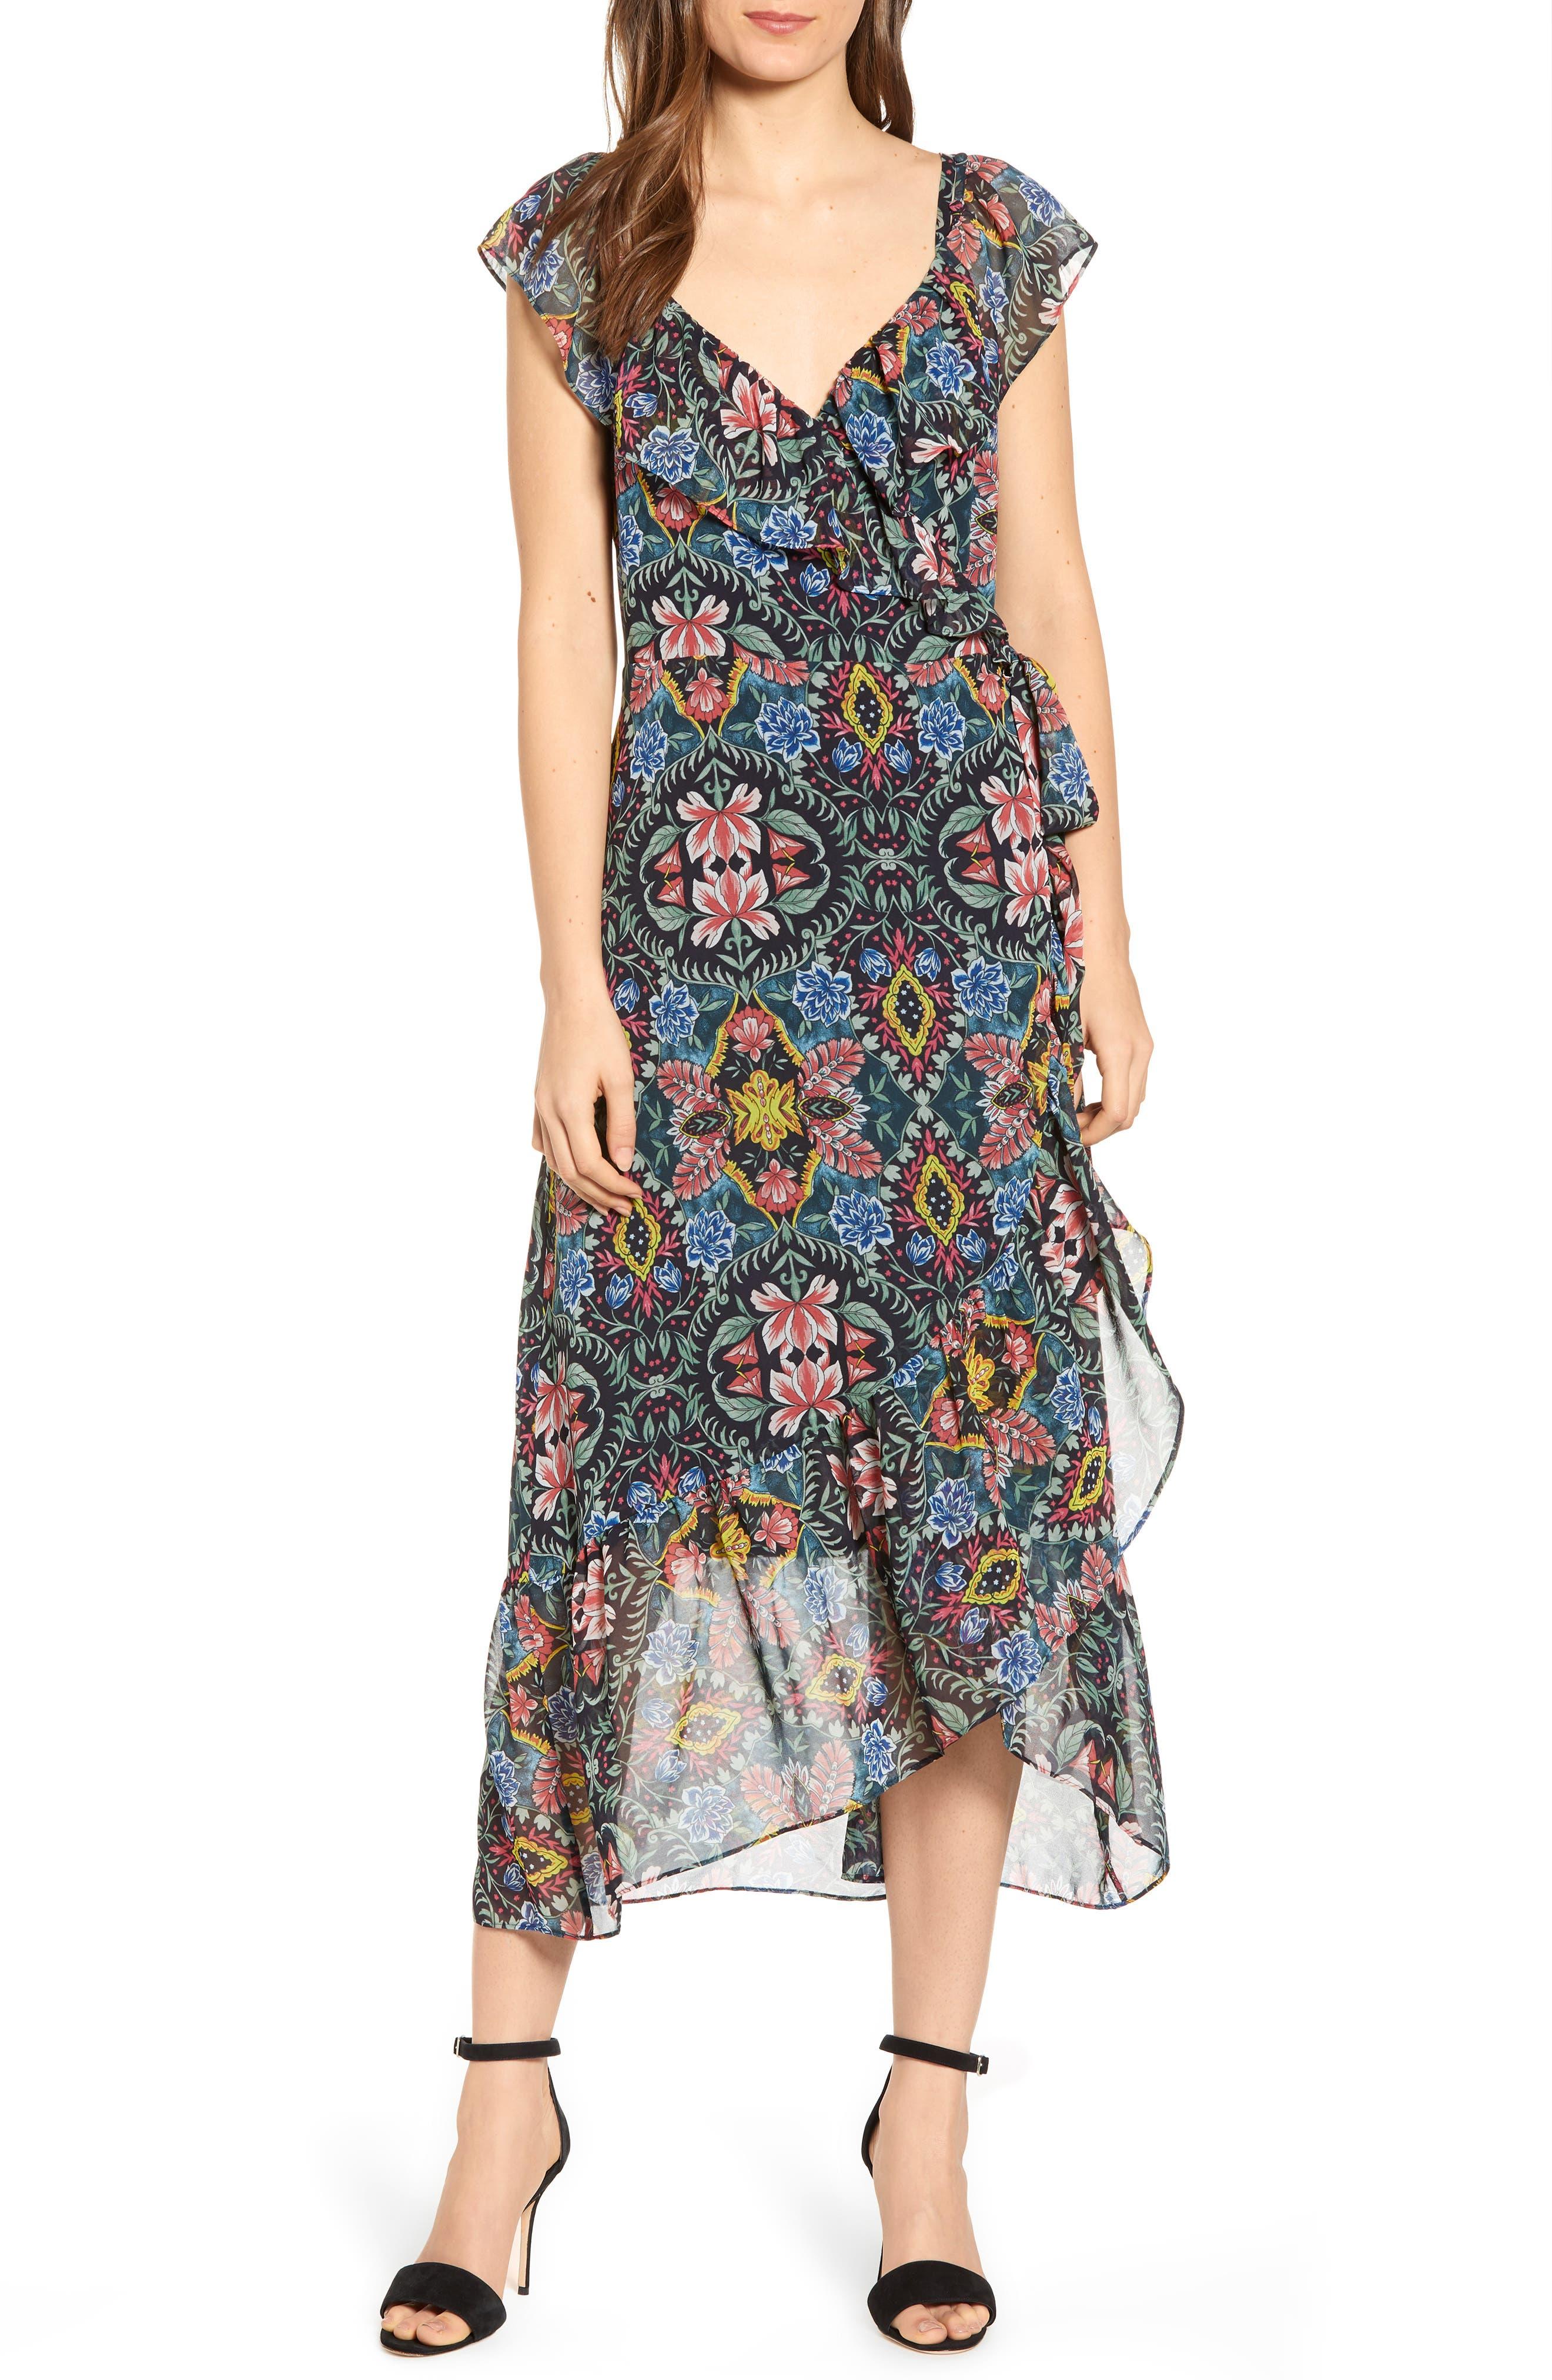 Rebecca Minkoff Jessica Floral Wrap Midi Dress, Black